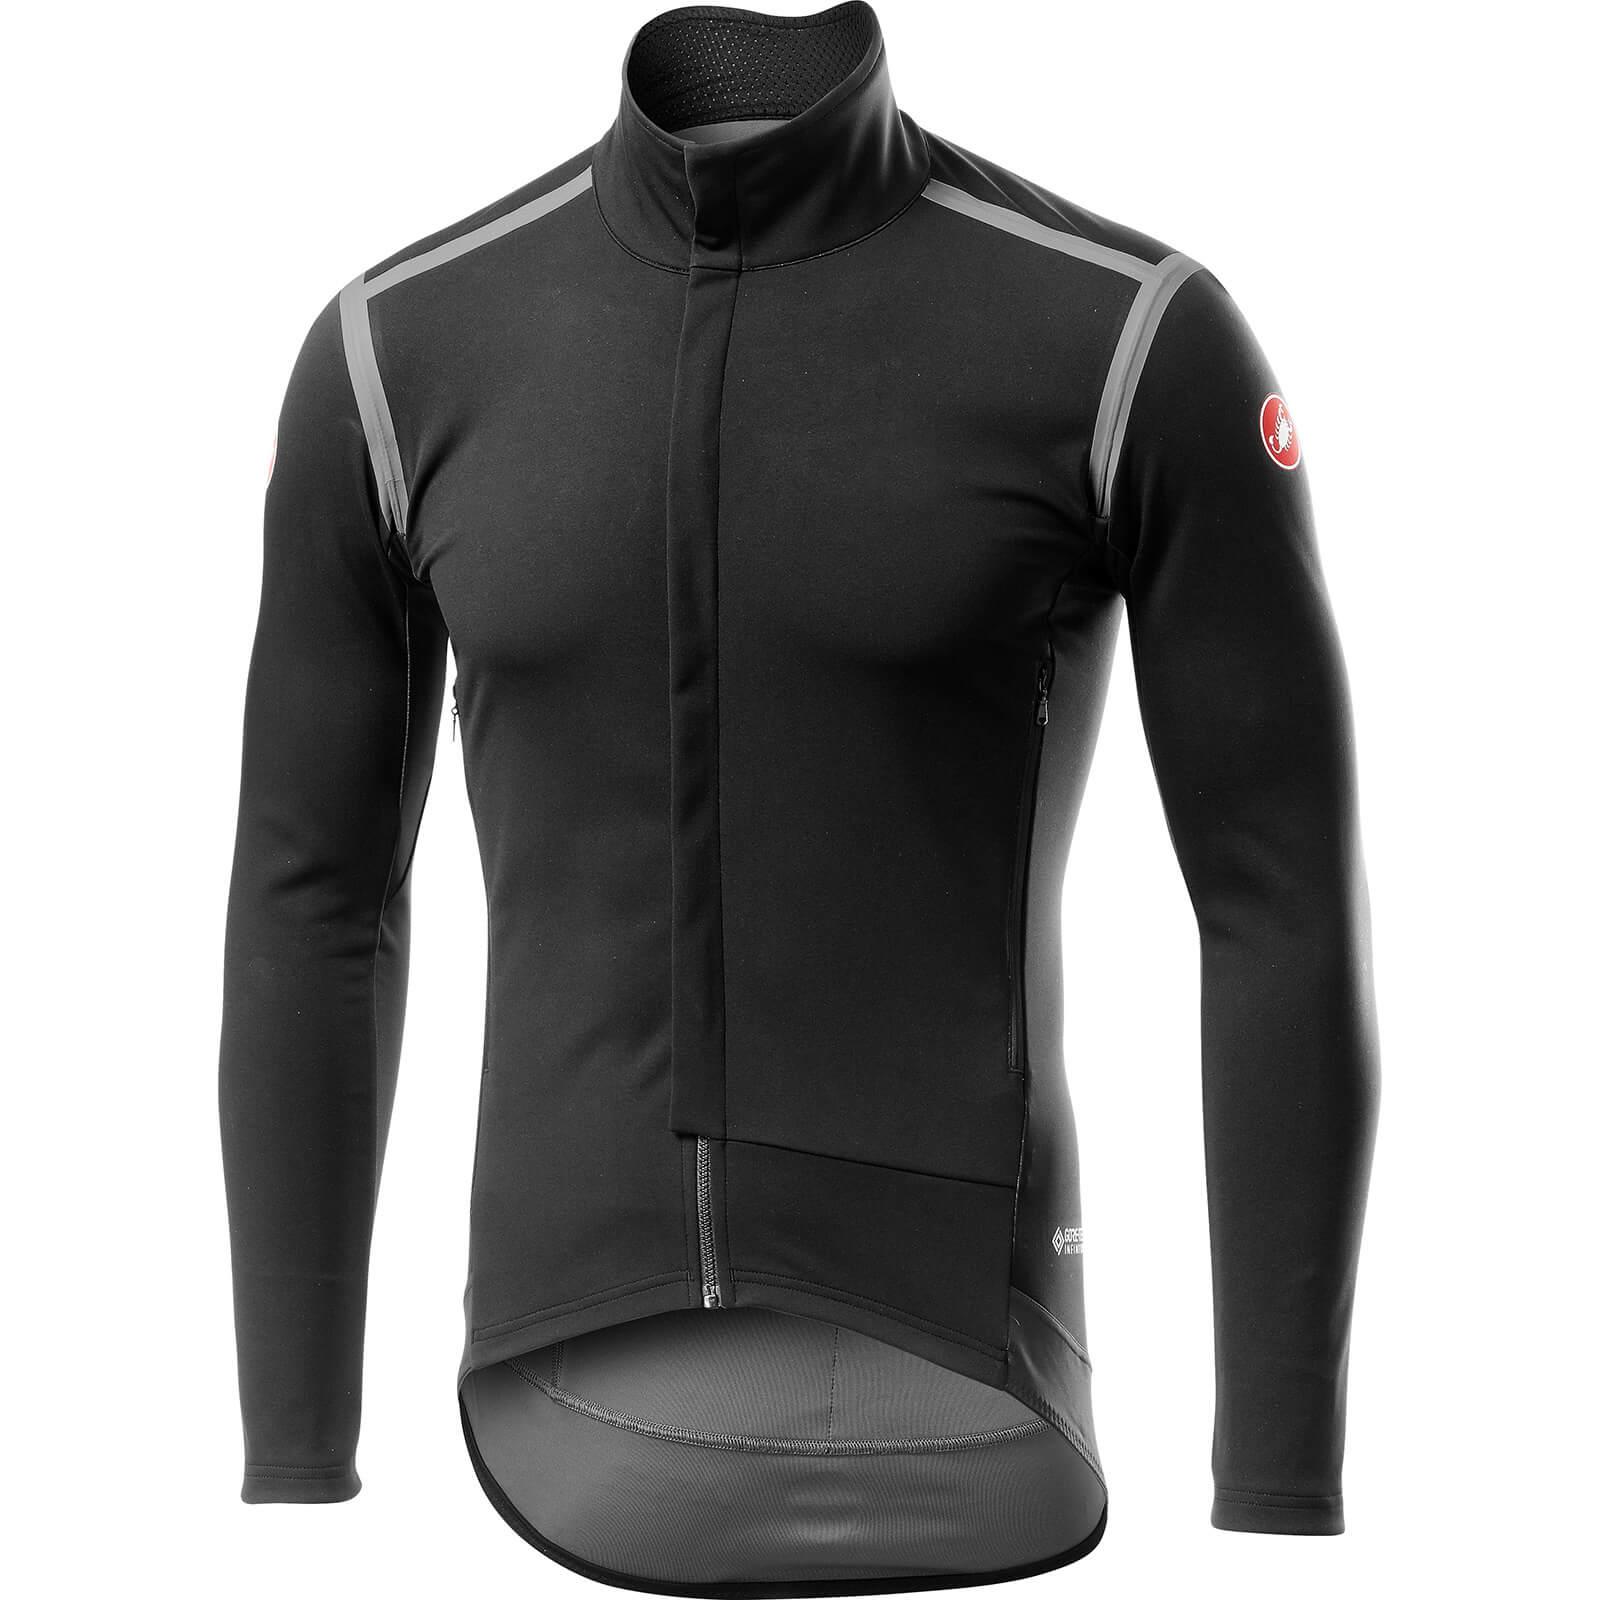 Castelli Perfetto RoS Long Sleeve Jacket - S - Light Black